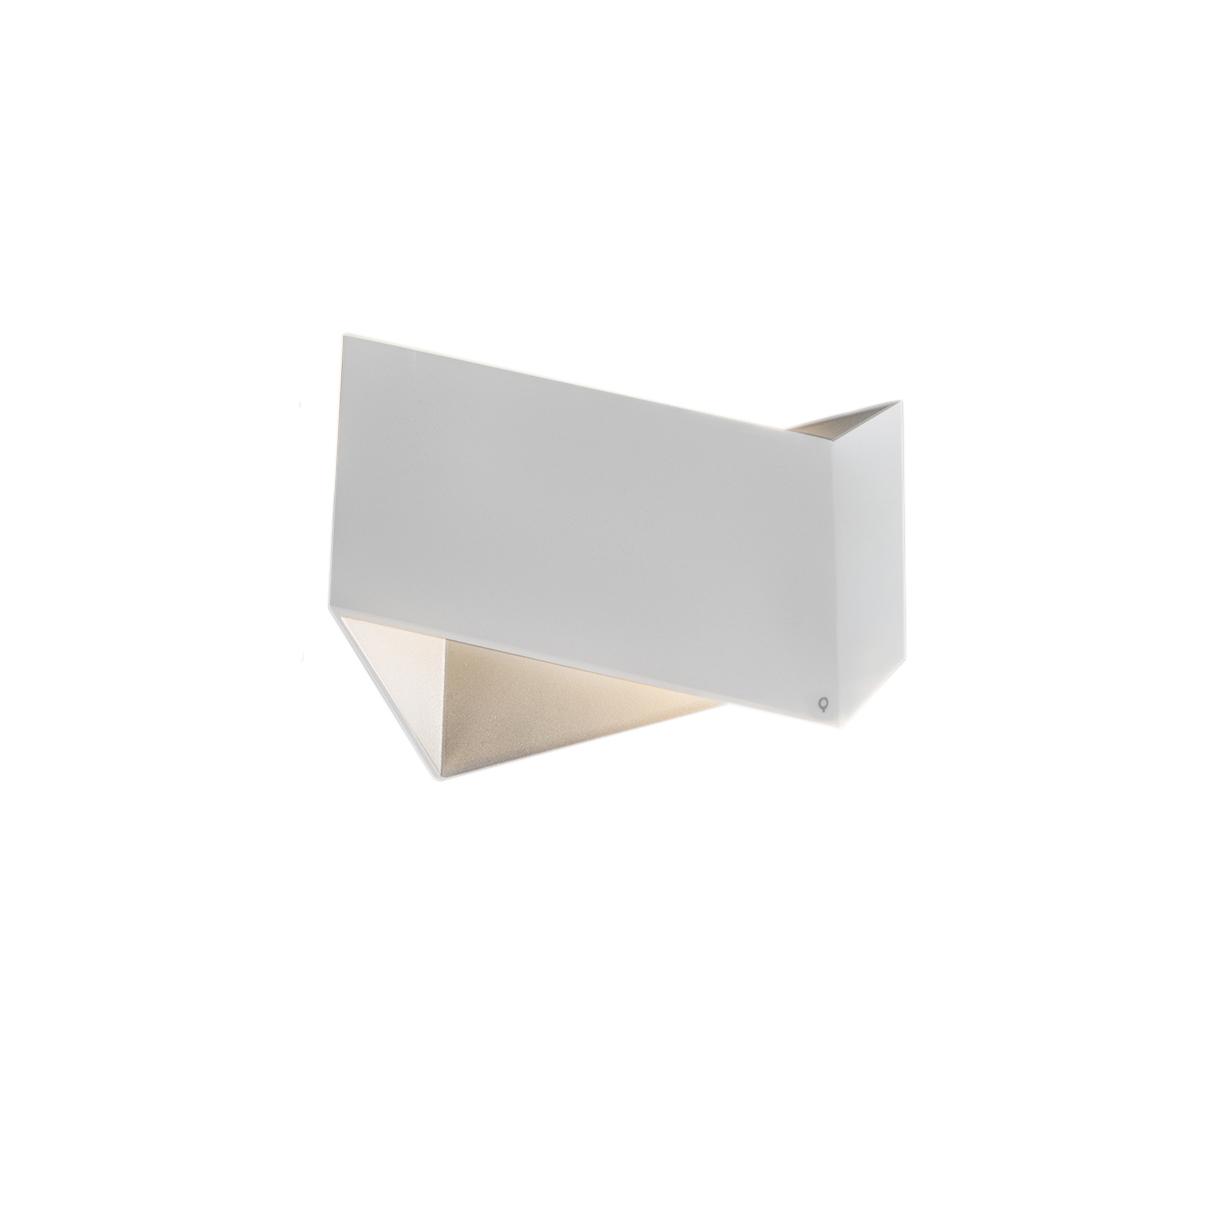 Set van 2 design wandlampen wit - Fold